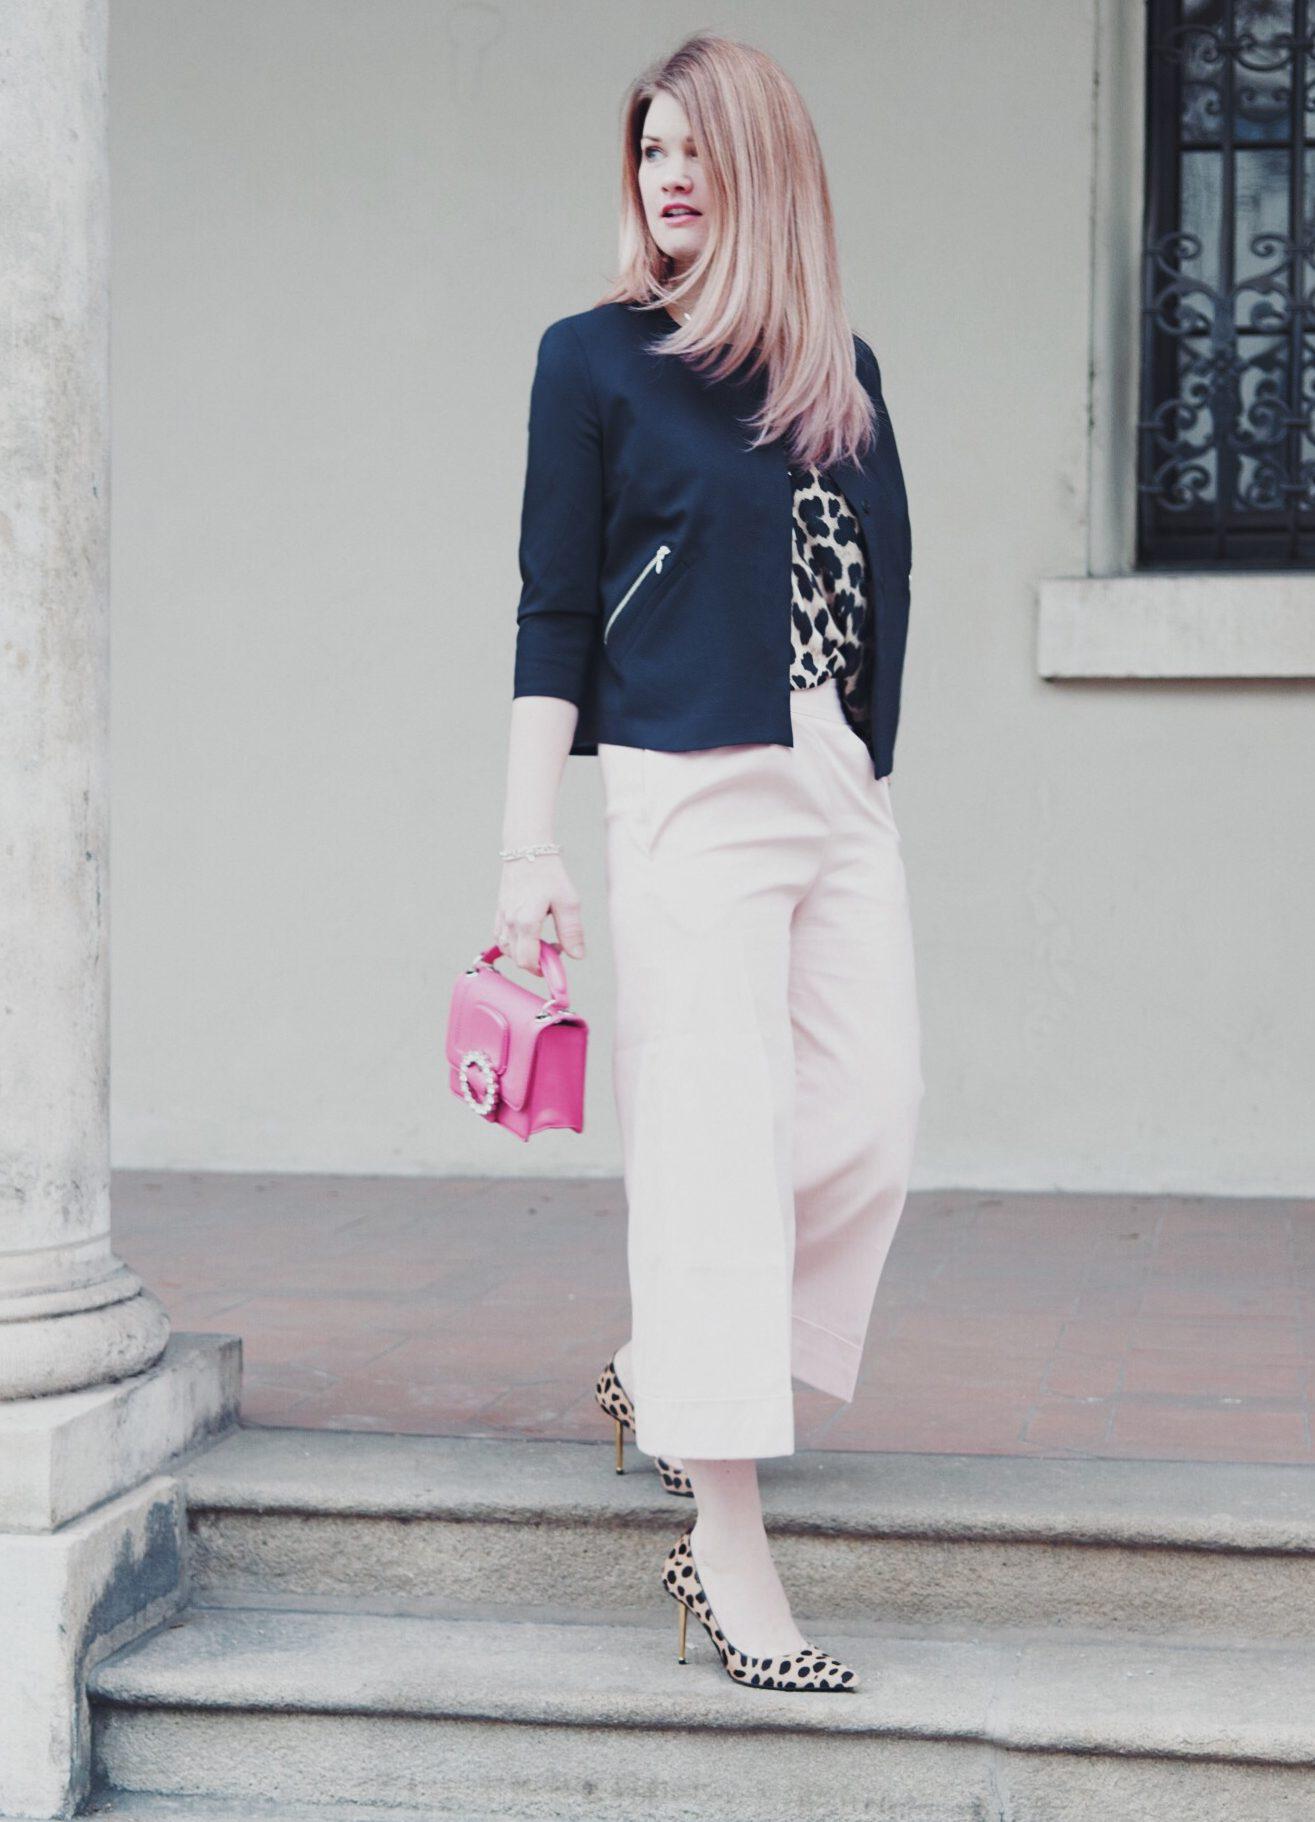 L'Oréal, Pineapples and Pumps, Animalprint, Tiffany and Co., Mac Cosmetics, Kolumne, Blog, Fashion Blog, Lifestyle, Flohmarkt, Munich, Zara, Tom Ford, Marc Jacobs